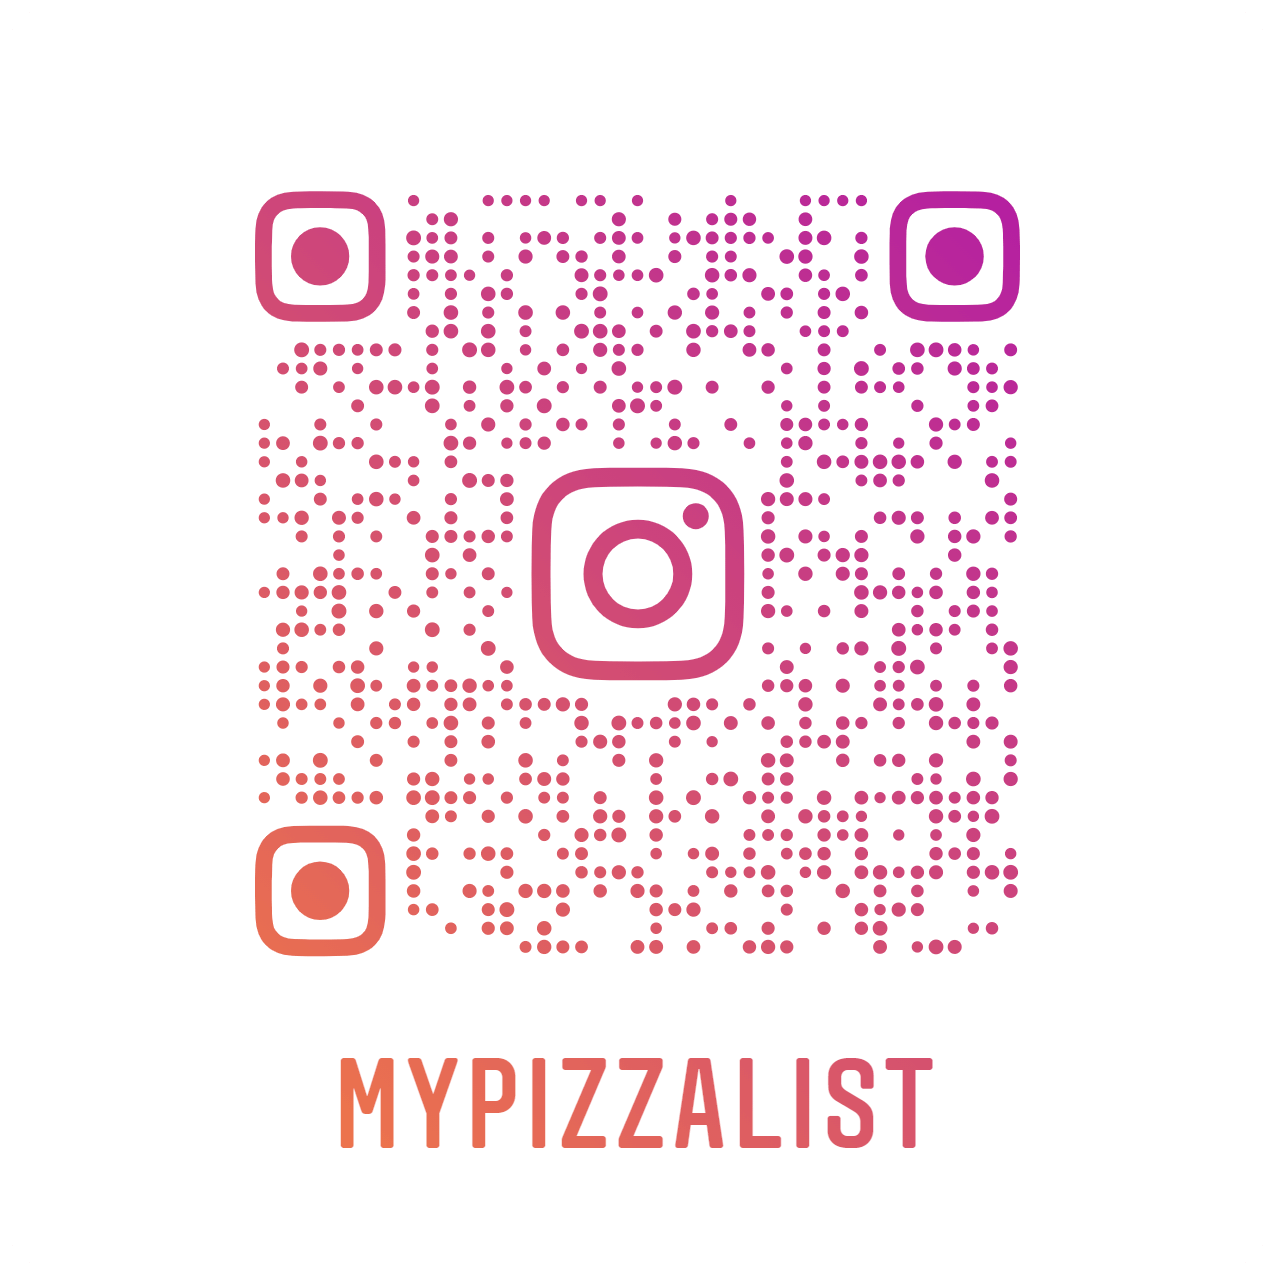 mypizzalist_nametag